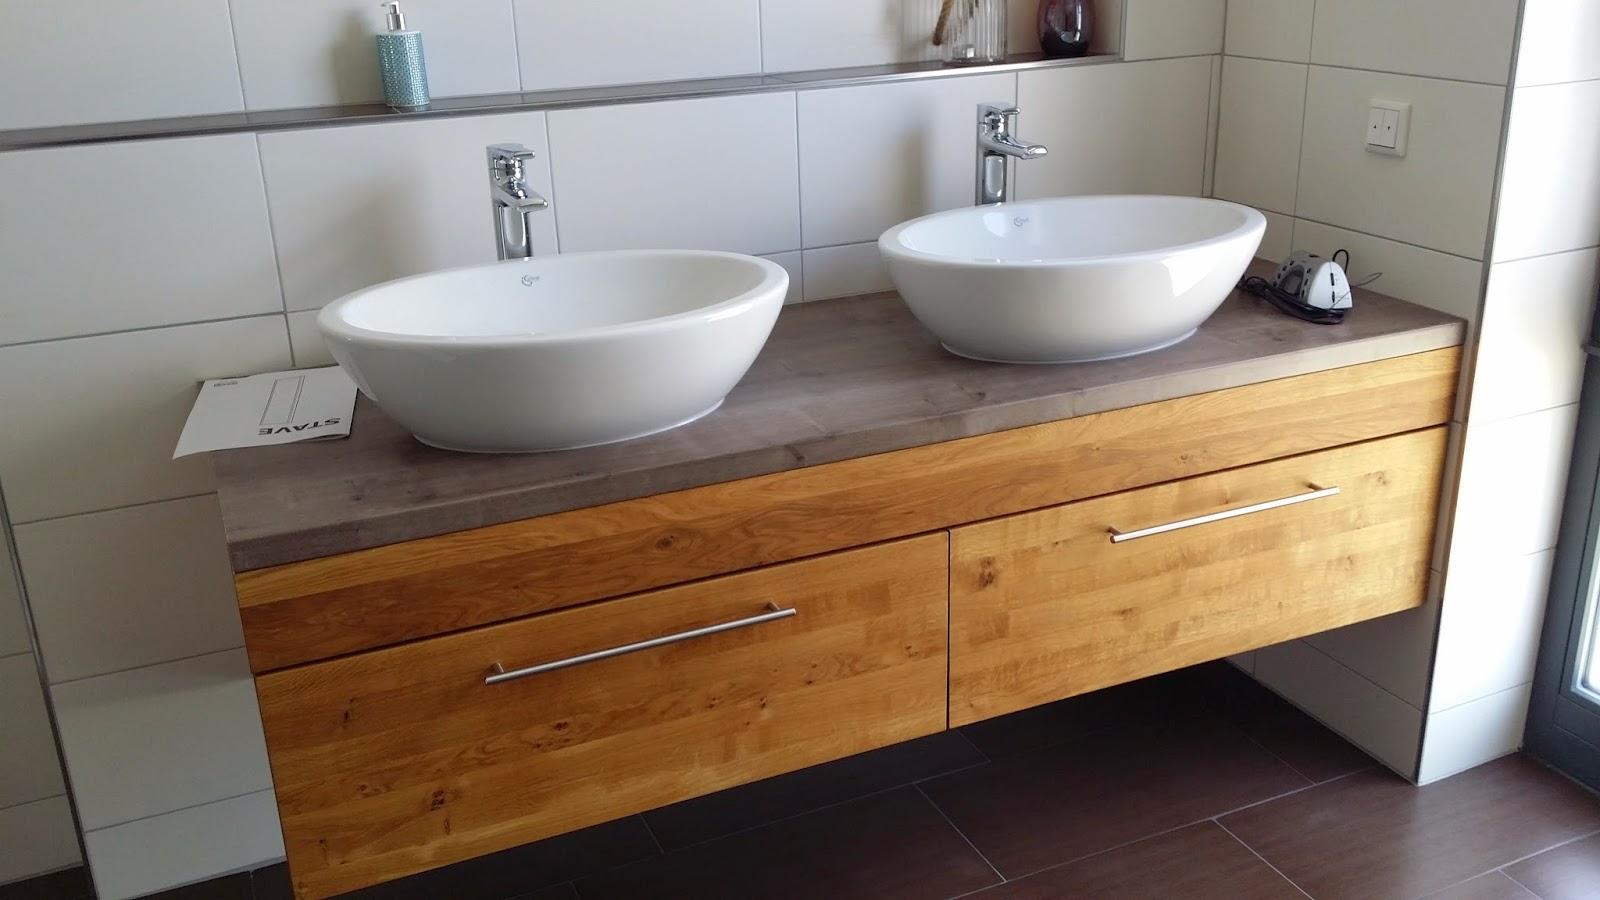 waschtischunterschrank holz selber machen. Black Bedroom Furniture Sets. Home Design Ideas